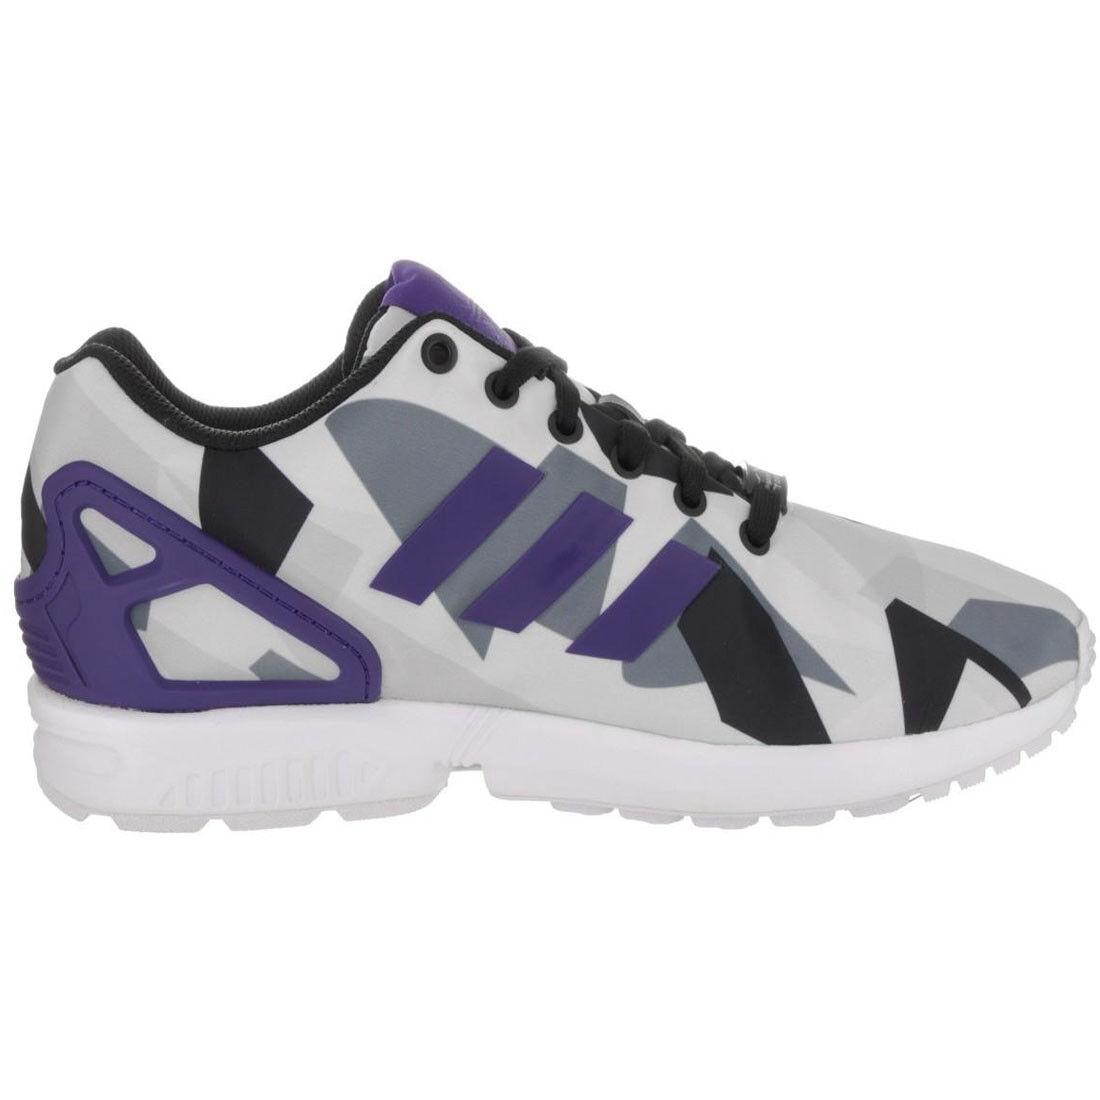 adidas Originals Unisex Running Trainers ZX Flux White Purple Torsion Shoes